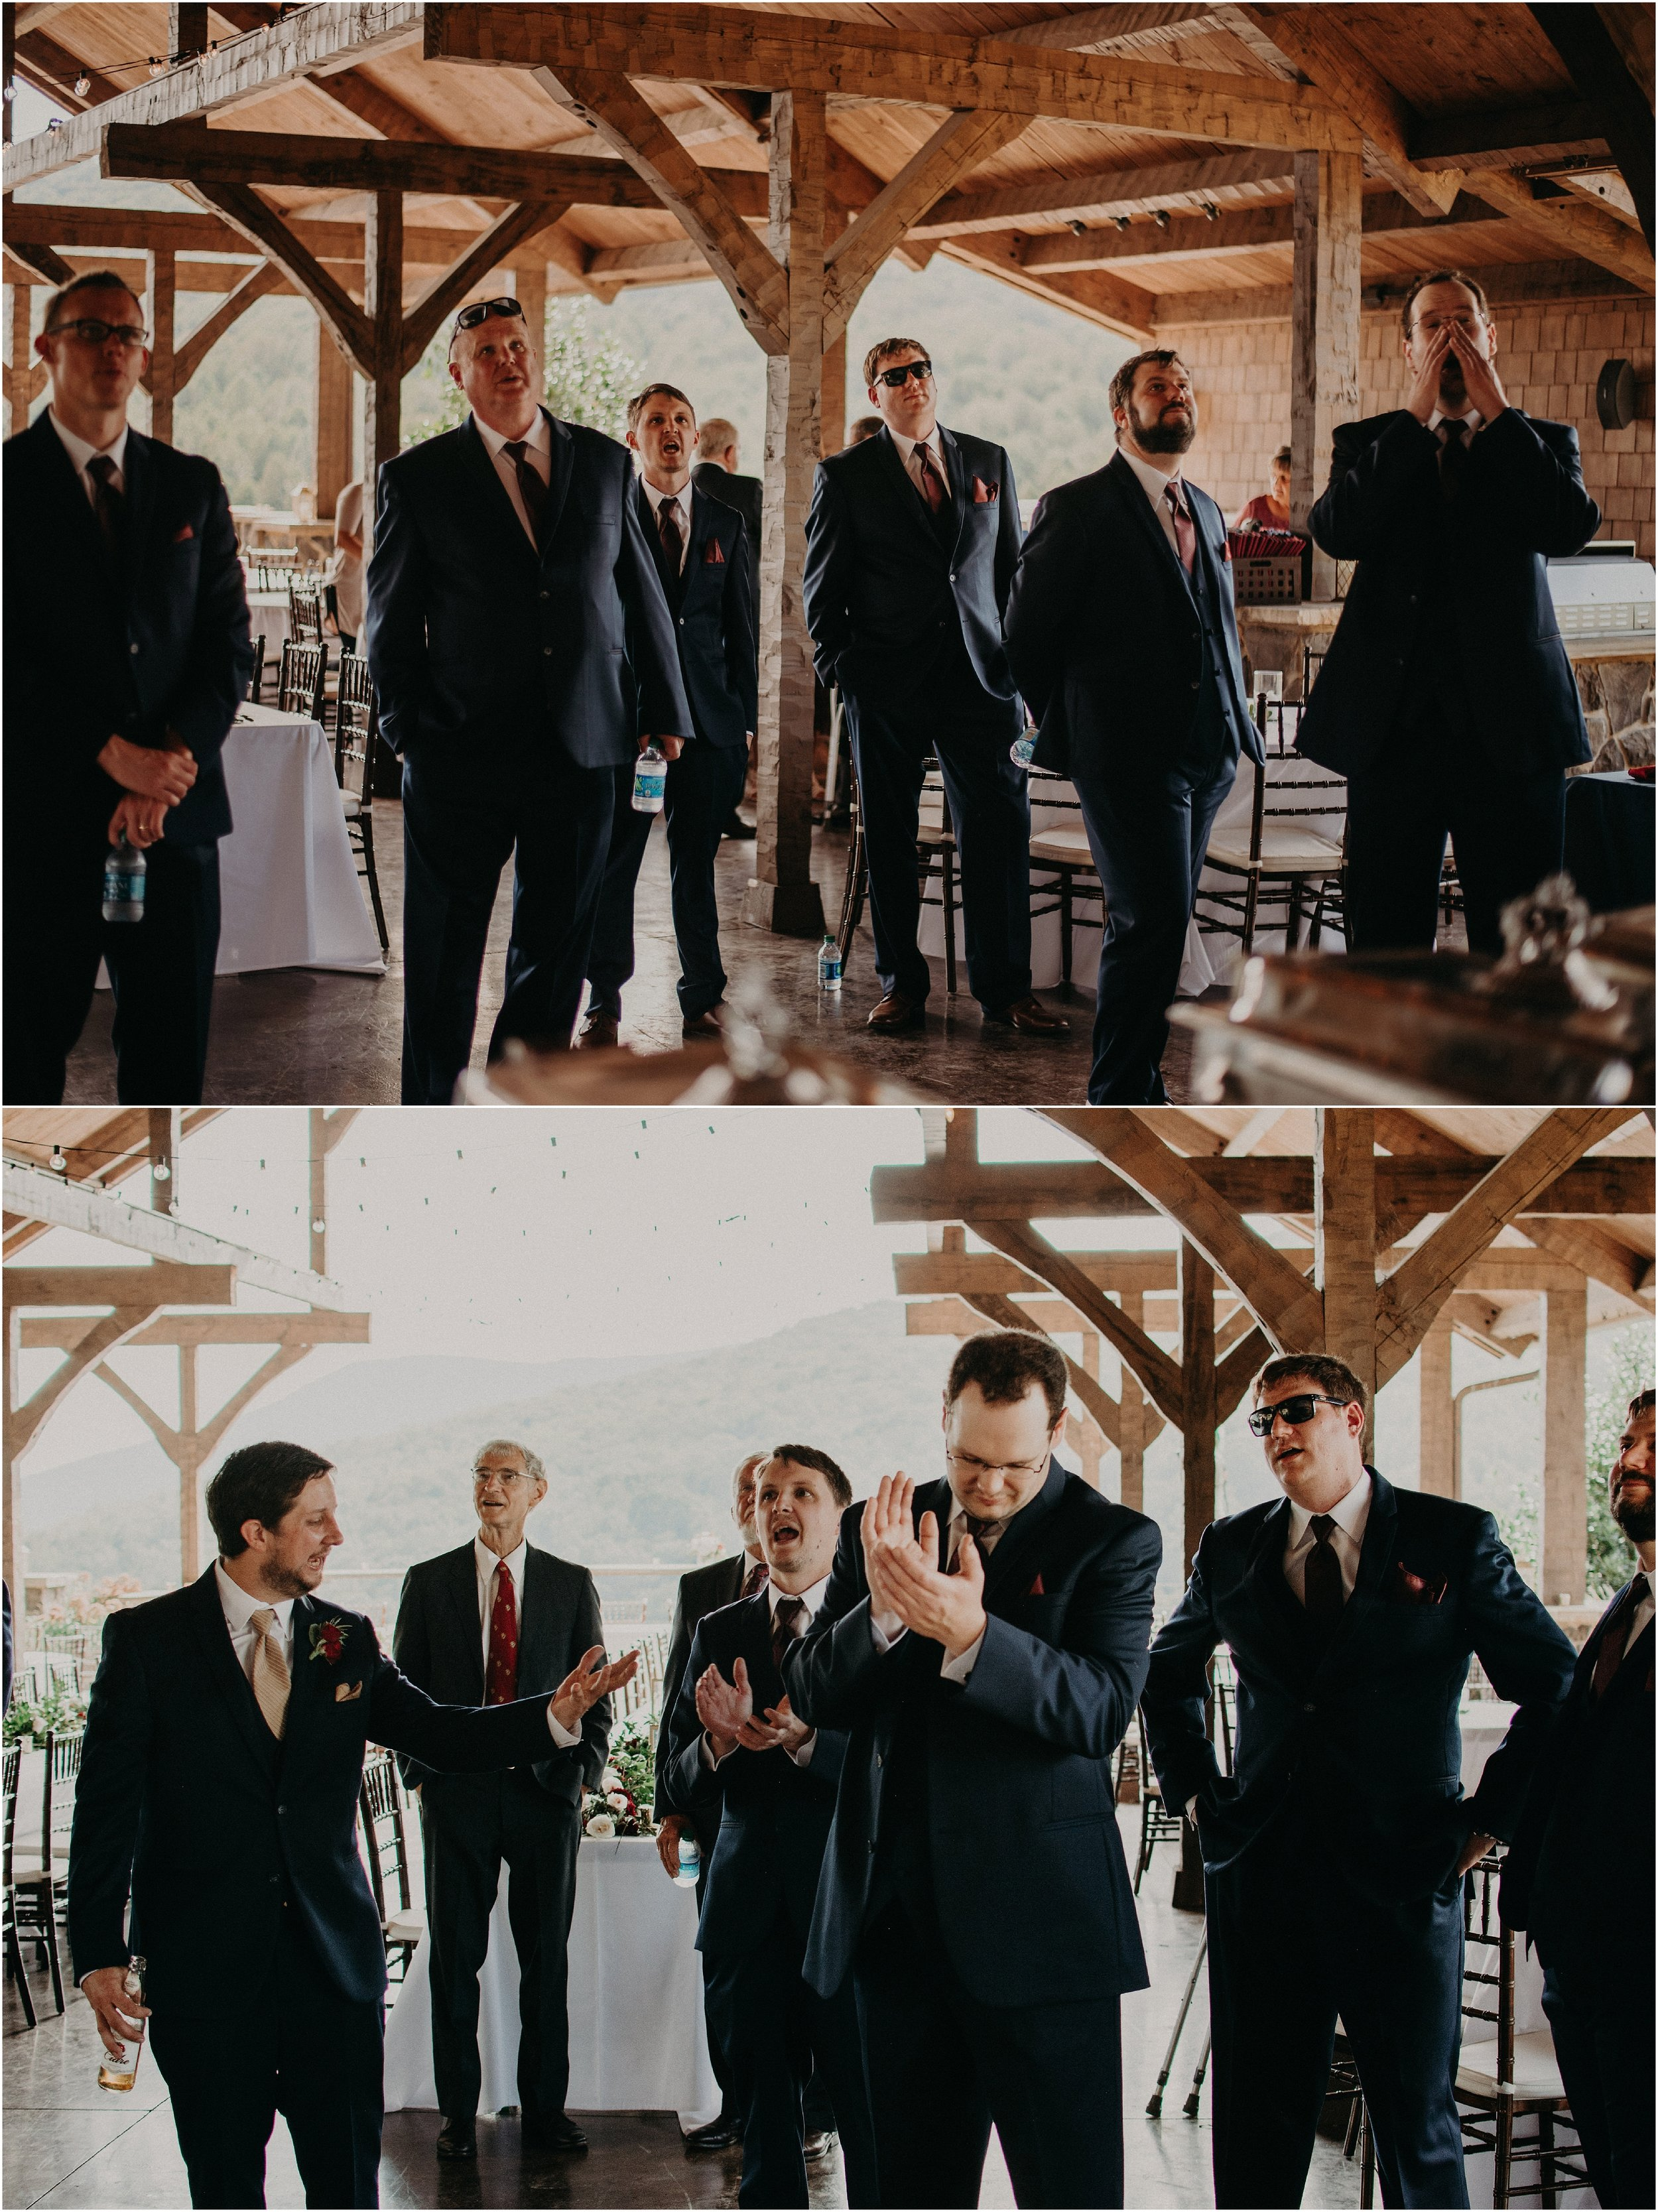 Groomsmen watching football game before wedding ceremony